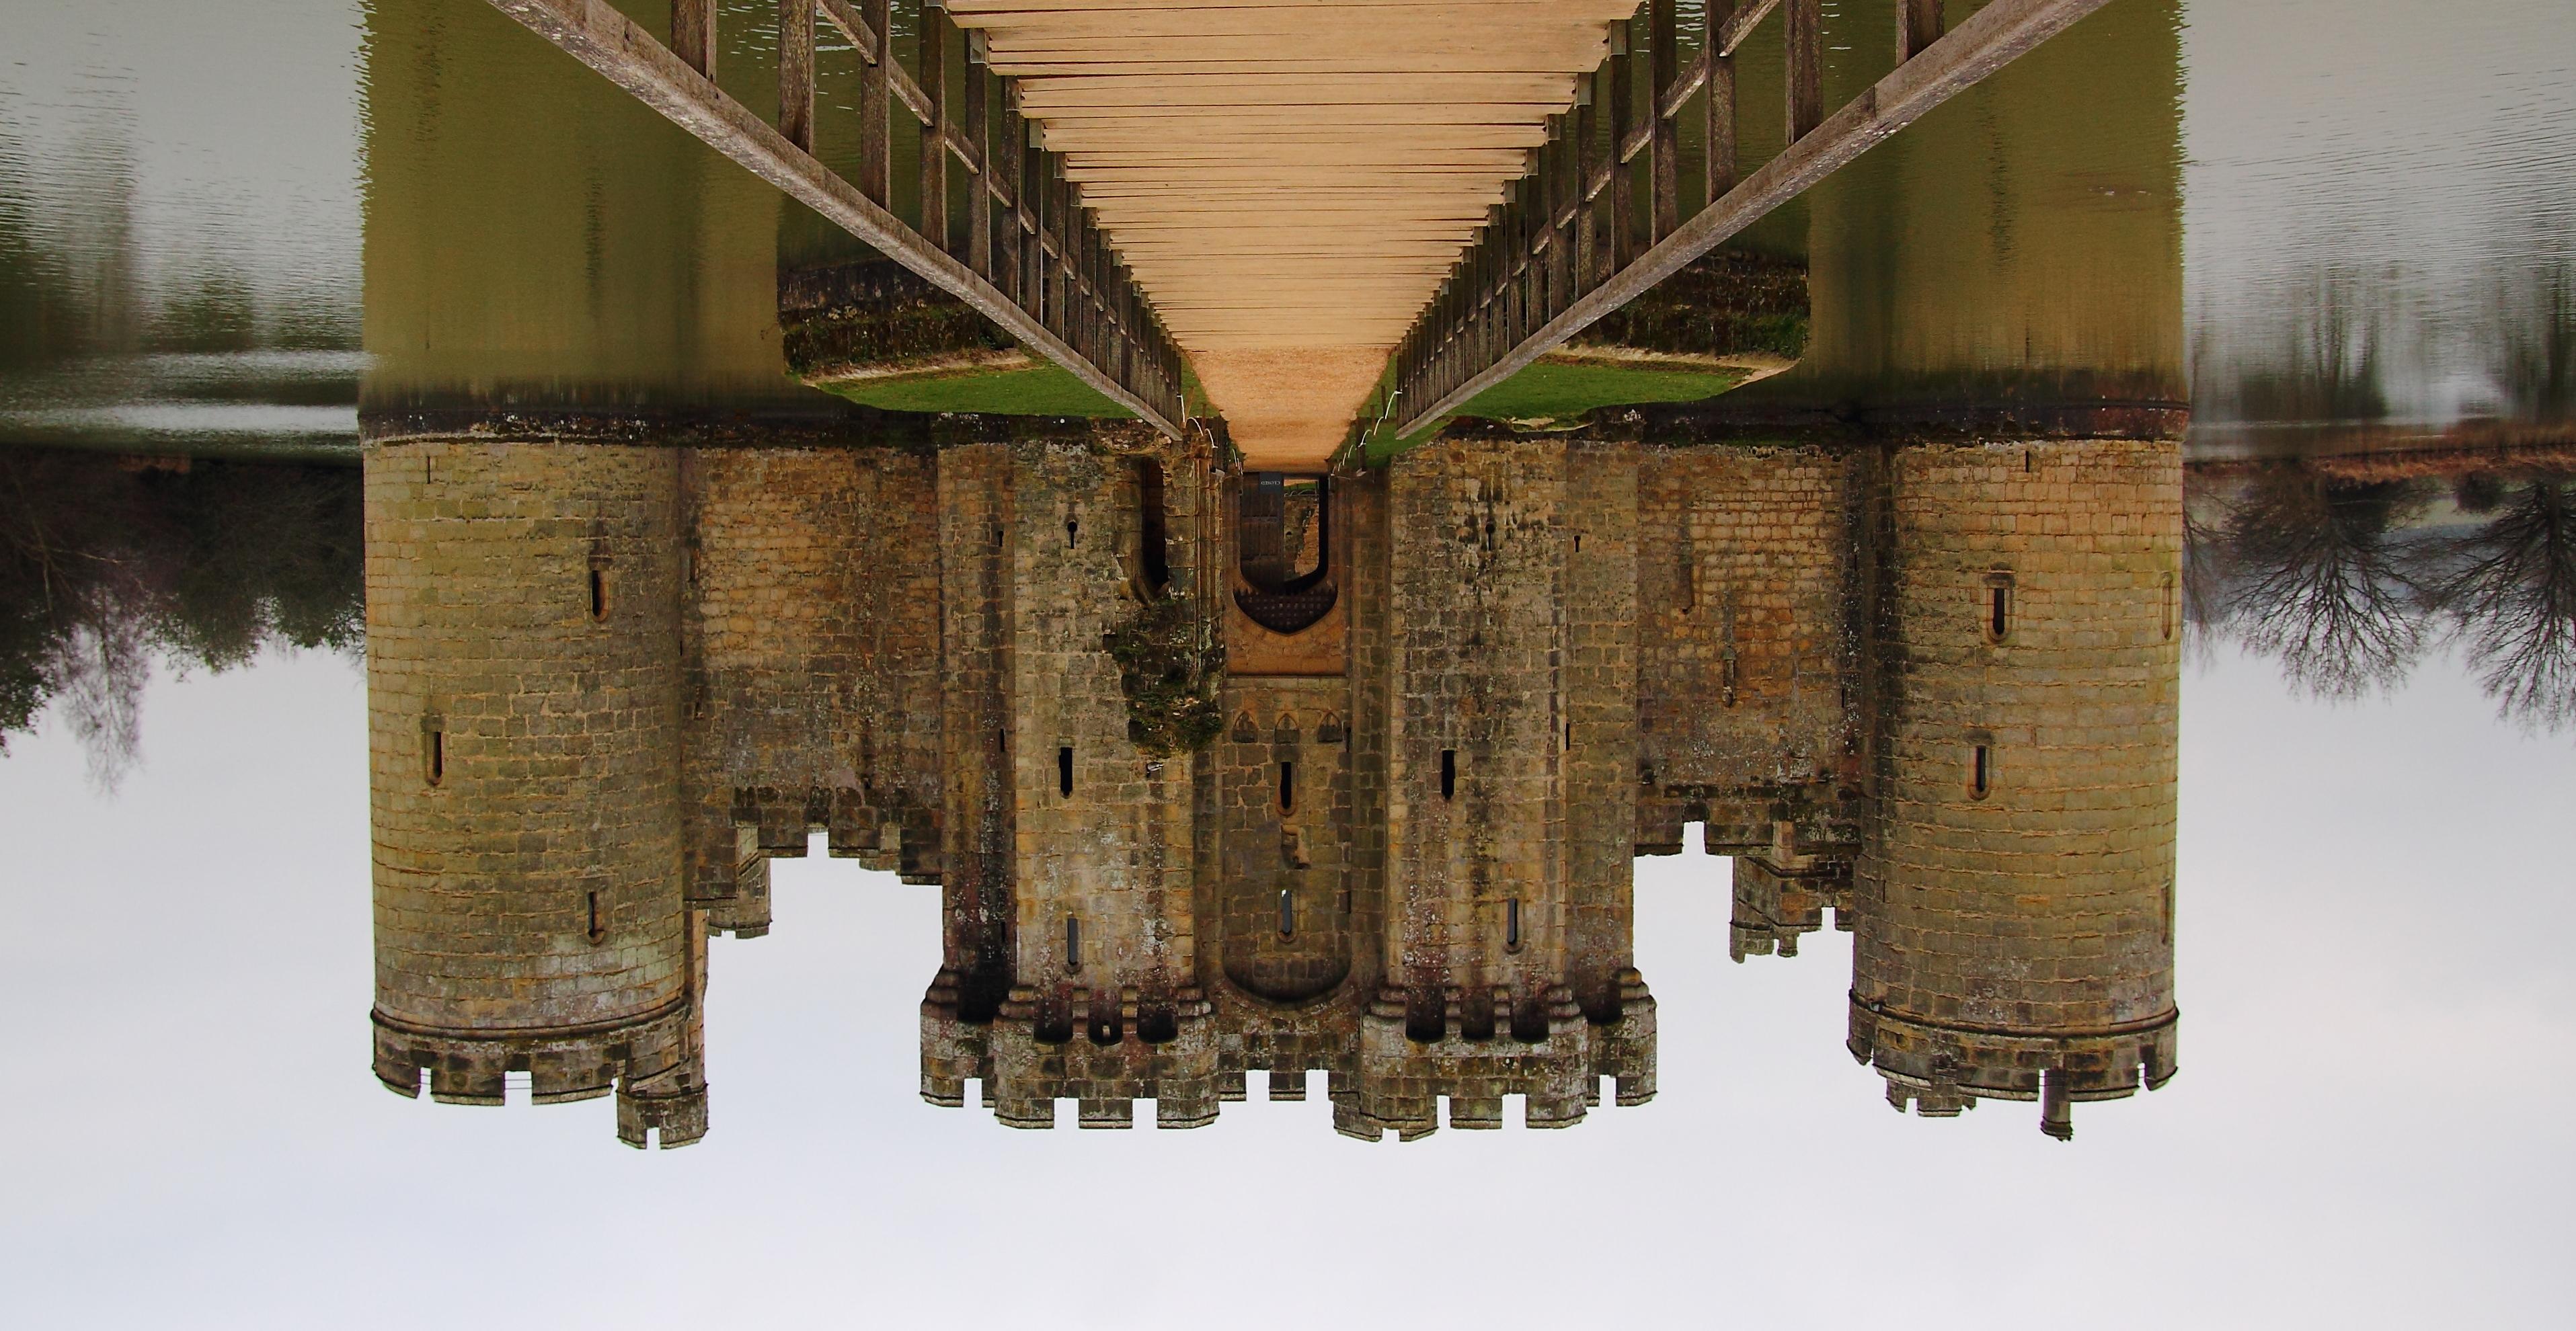 upside-down-kingdom